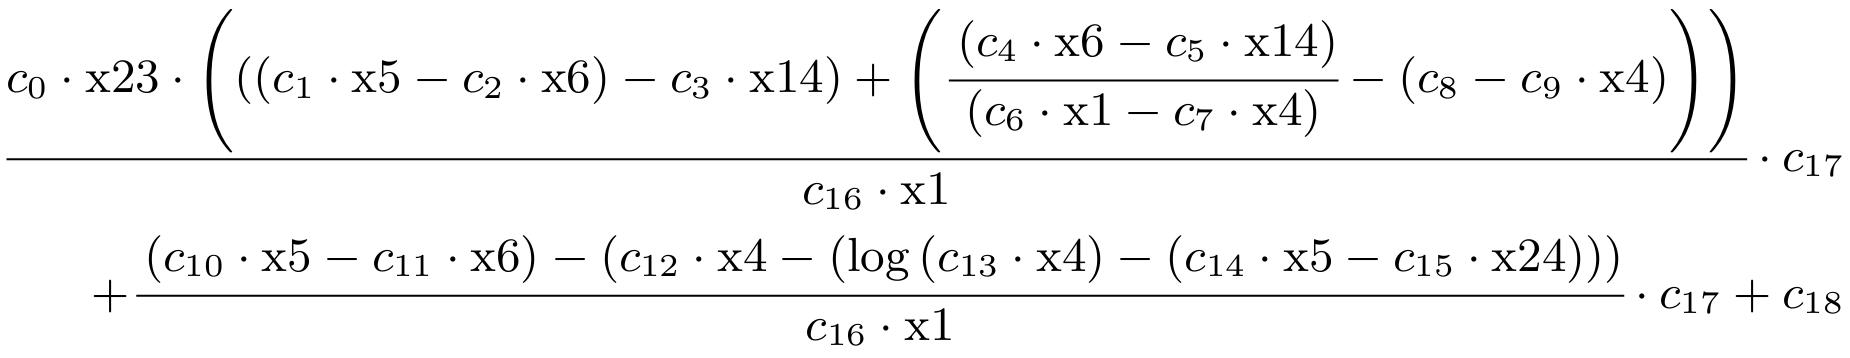 AdditionalMaterial/ECML-PKDD – HeuristicLab